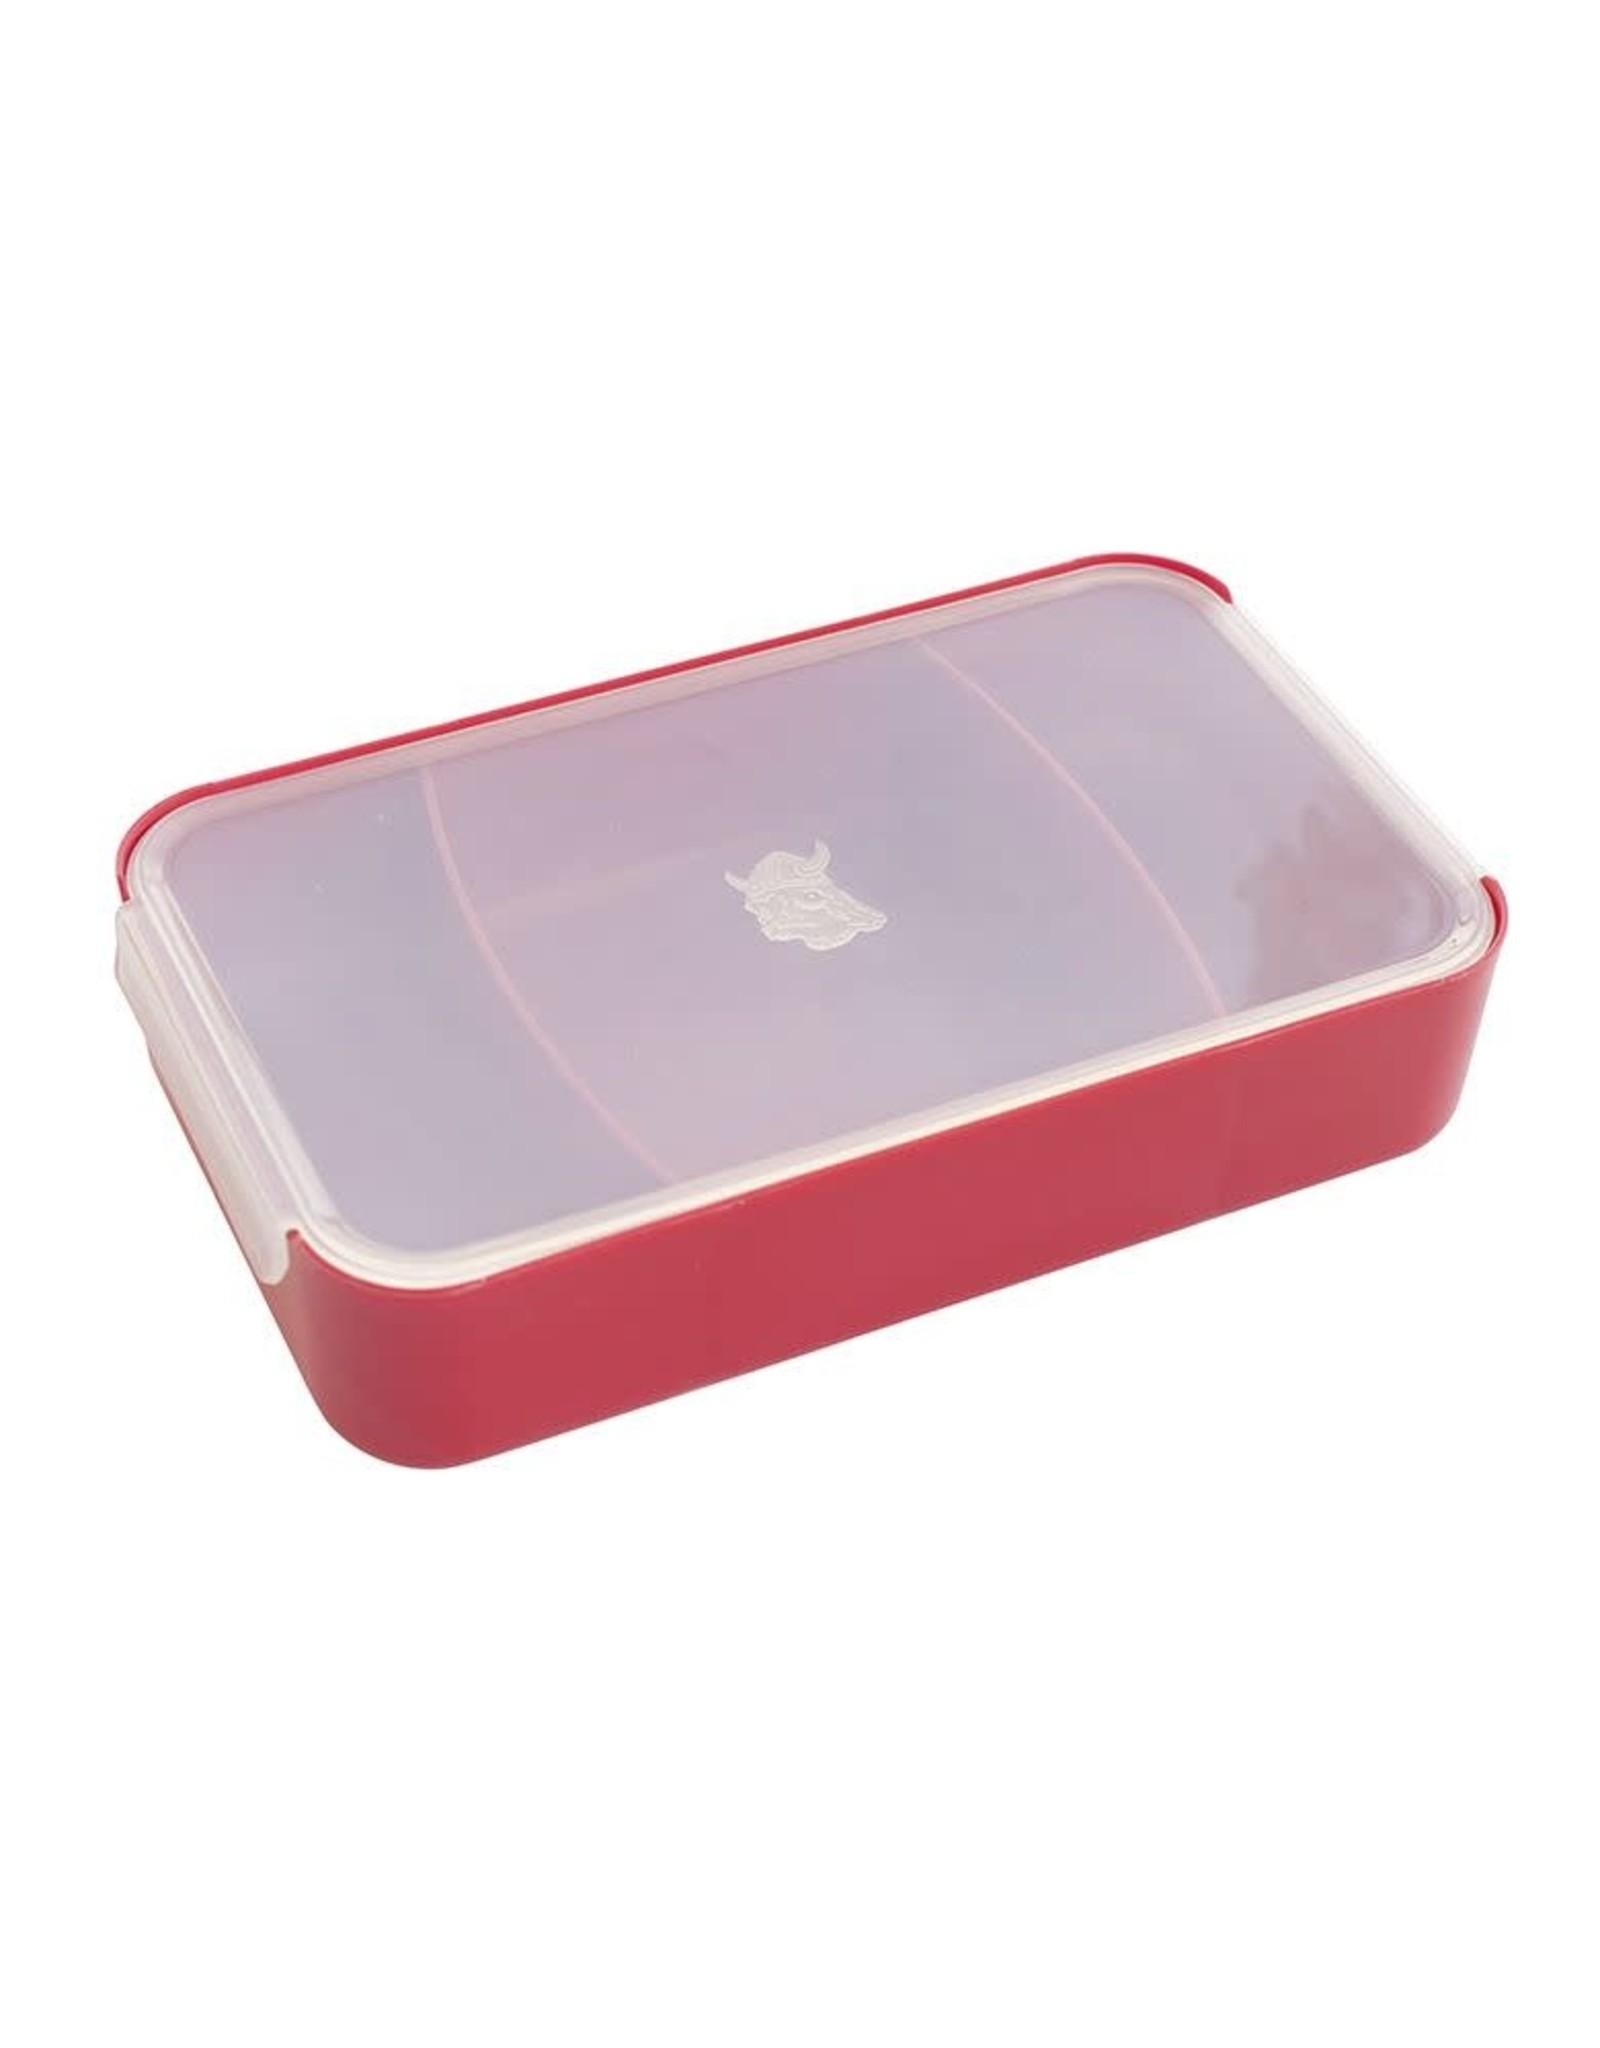 Nordic Ware Bento Box, Red